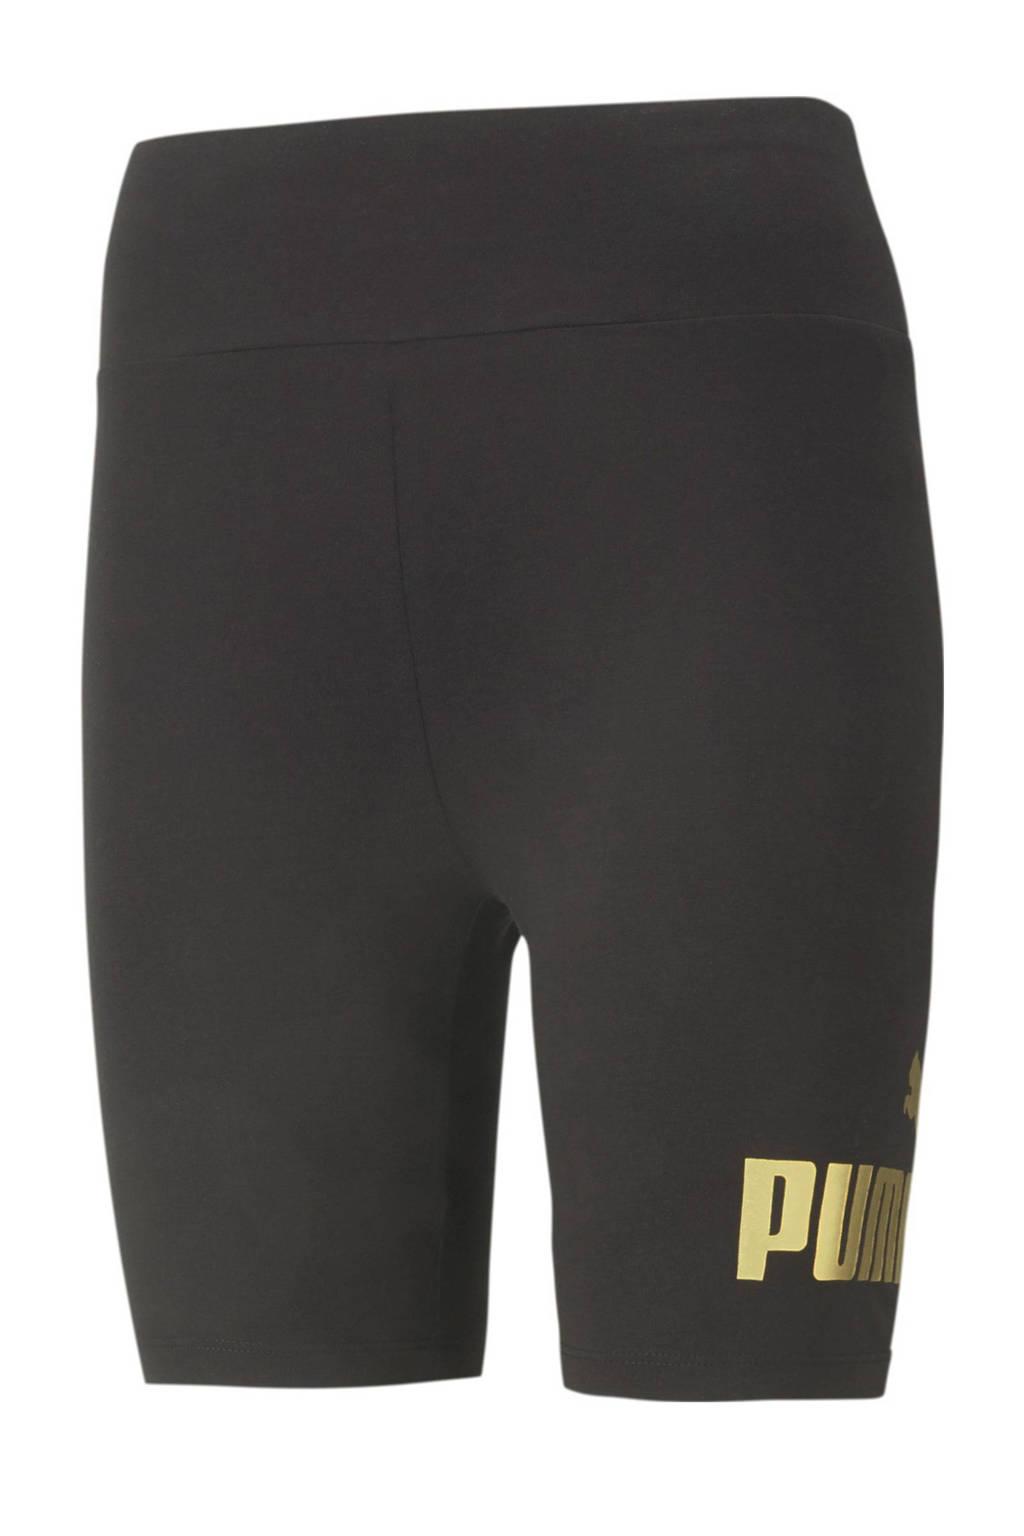 Puma high waist slim fit broek met logo zwart/goud, Zwart/goud